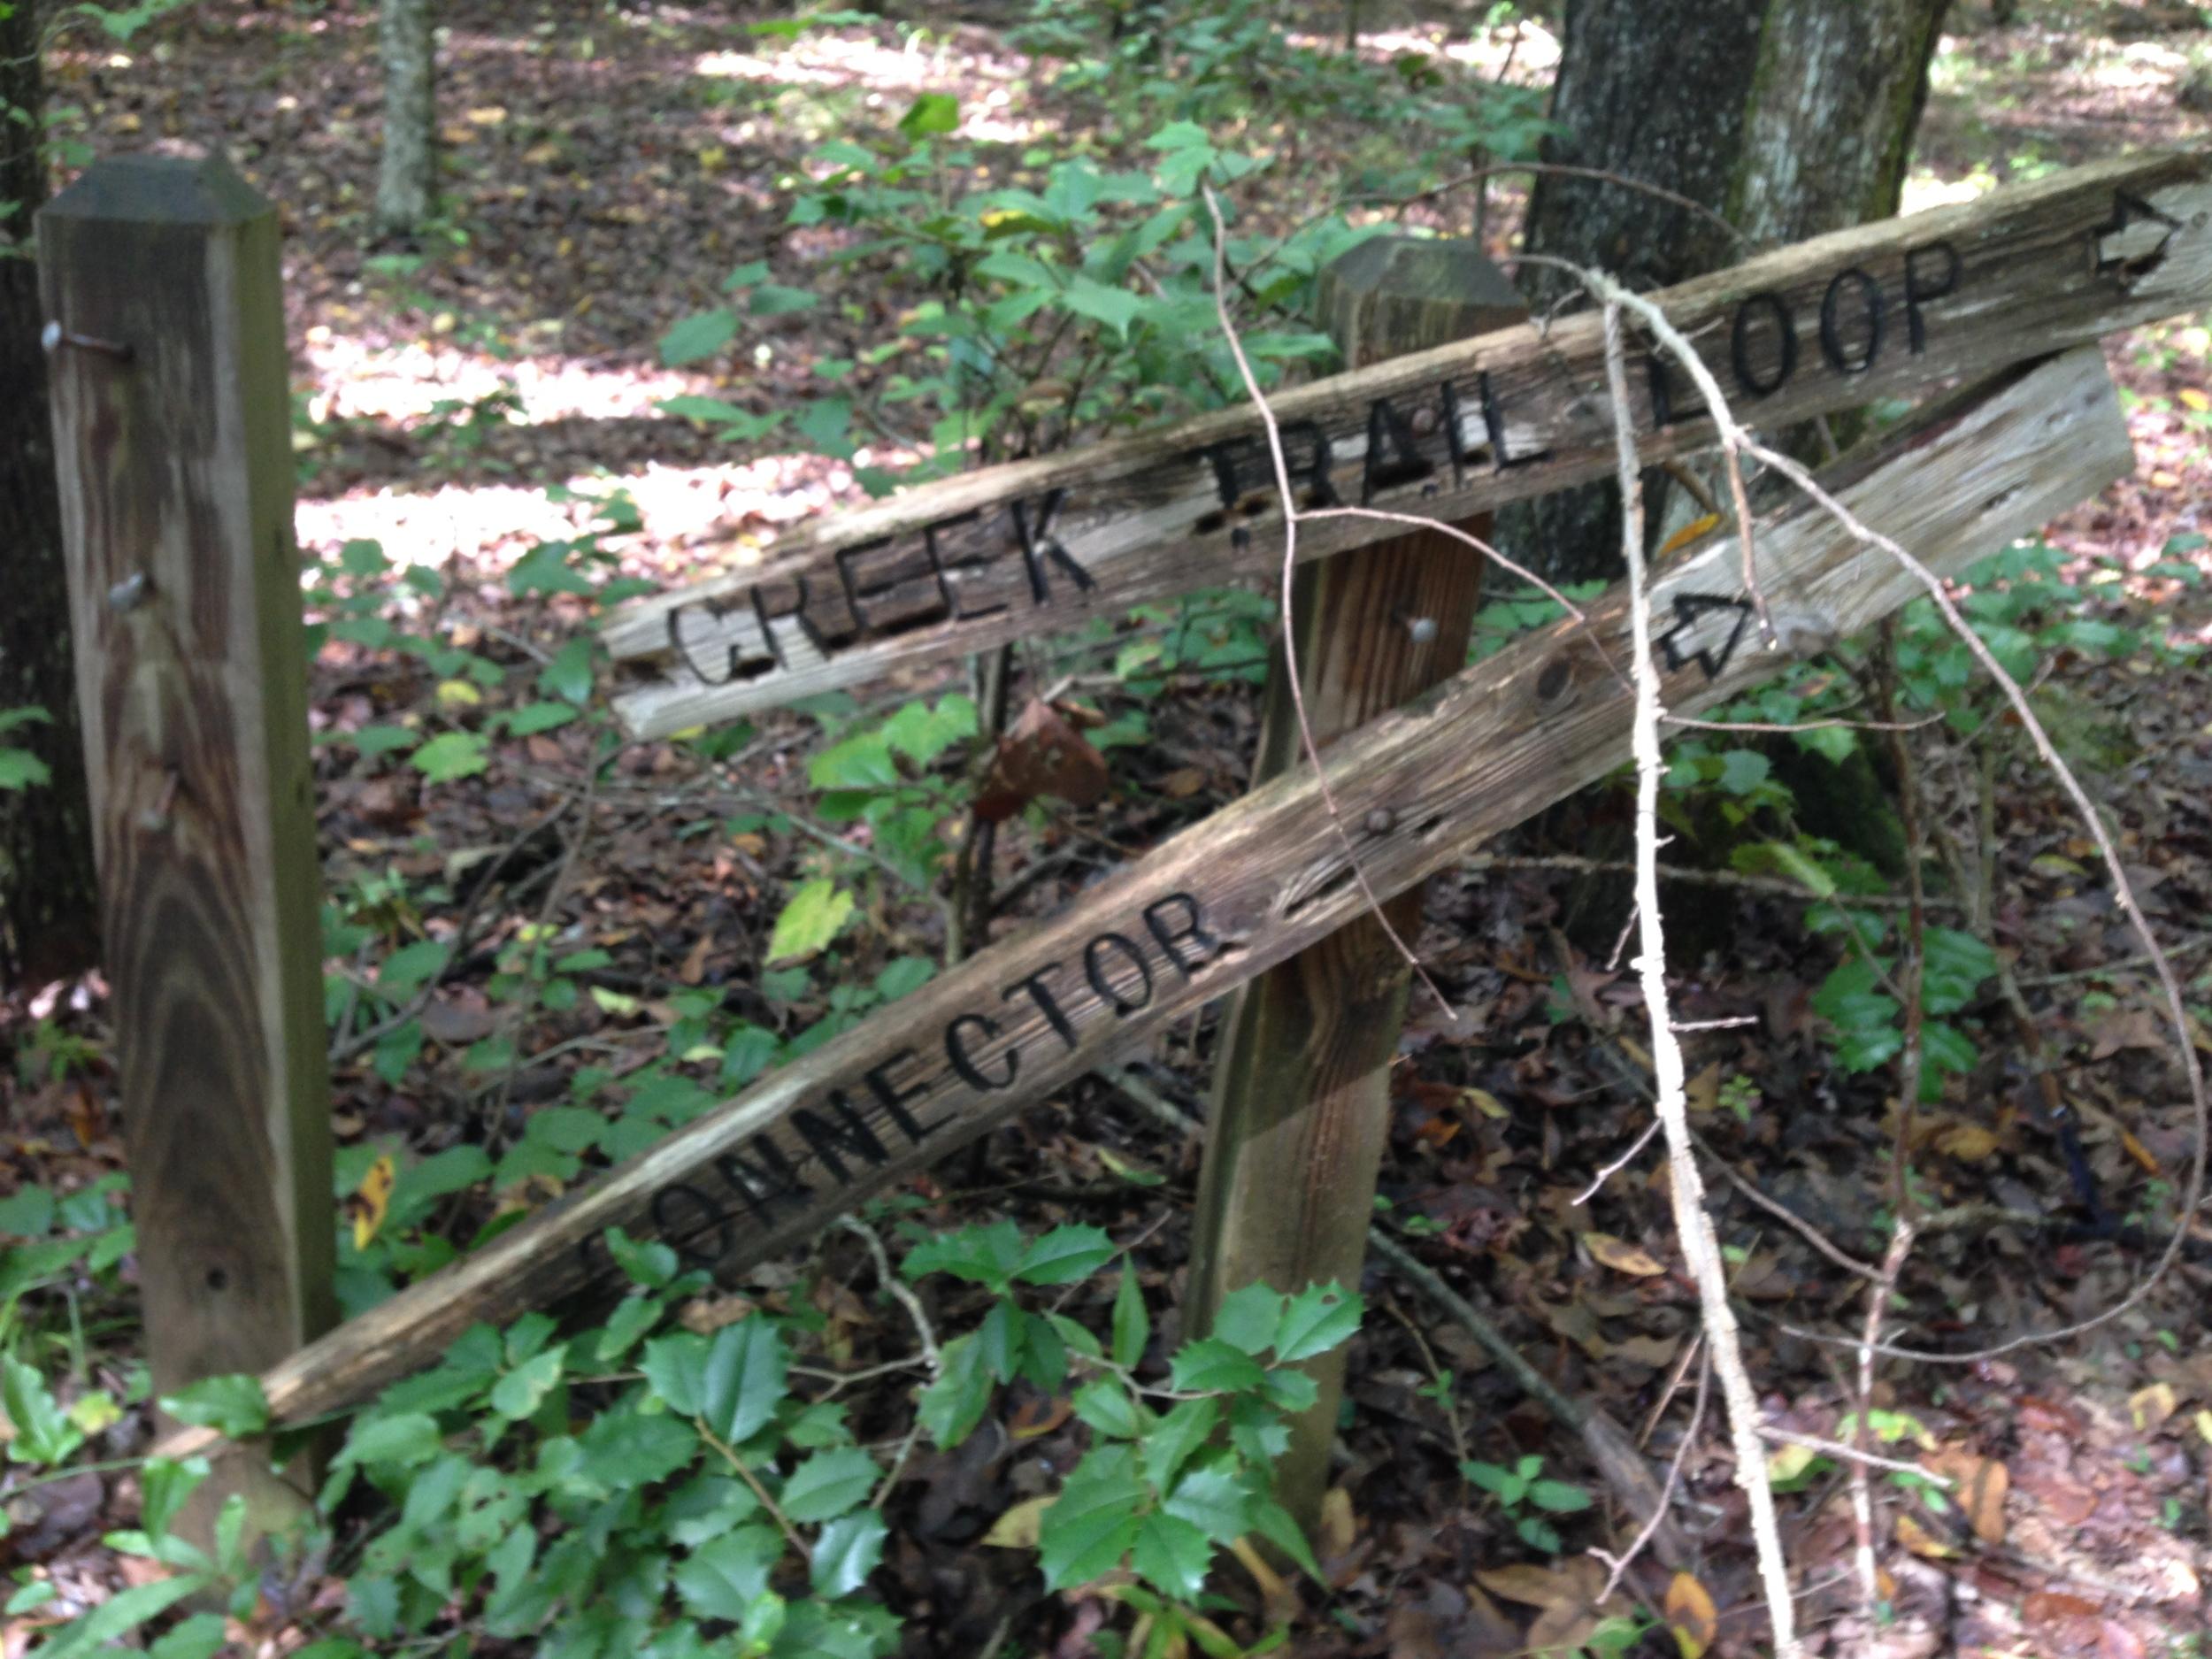 Fallen trail signs